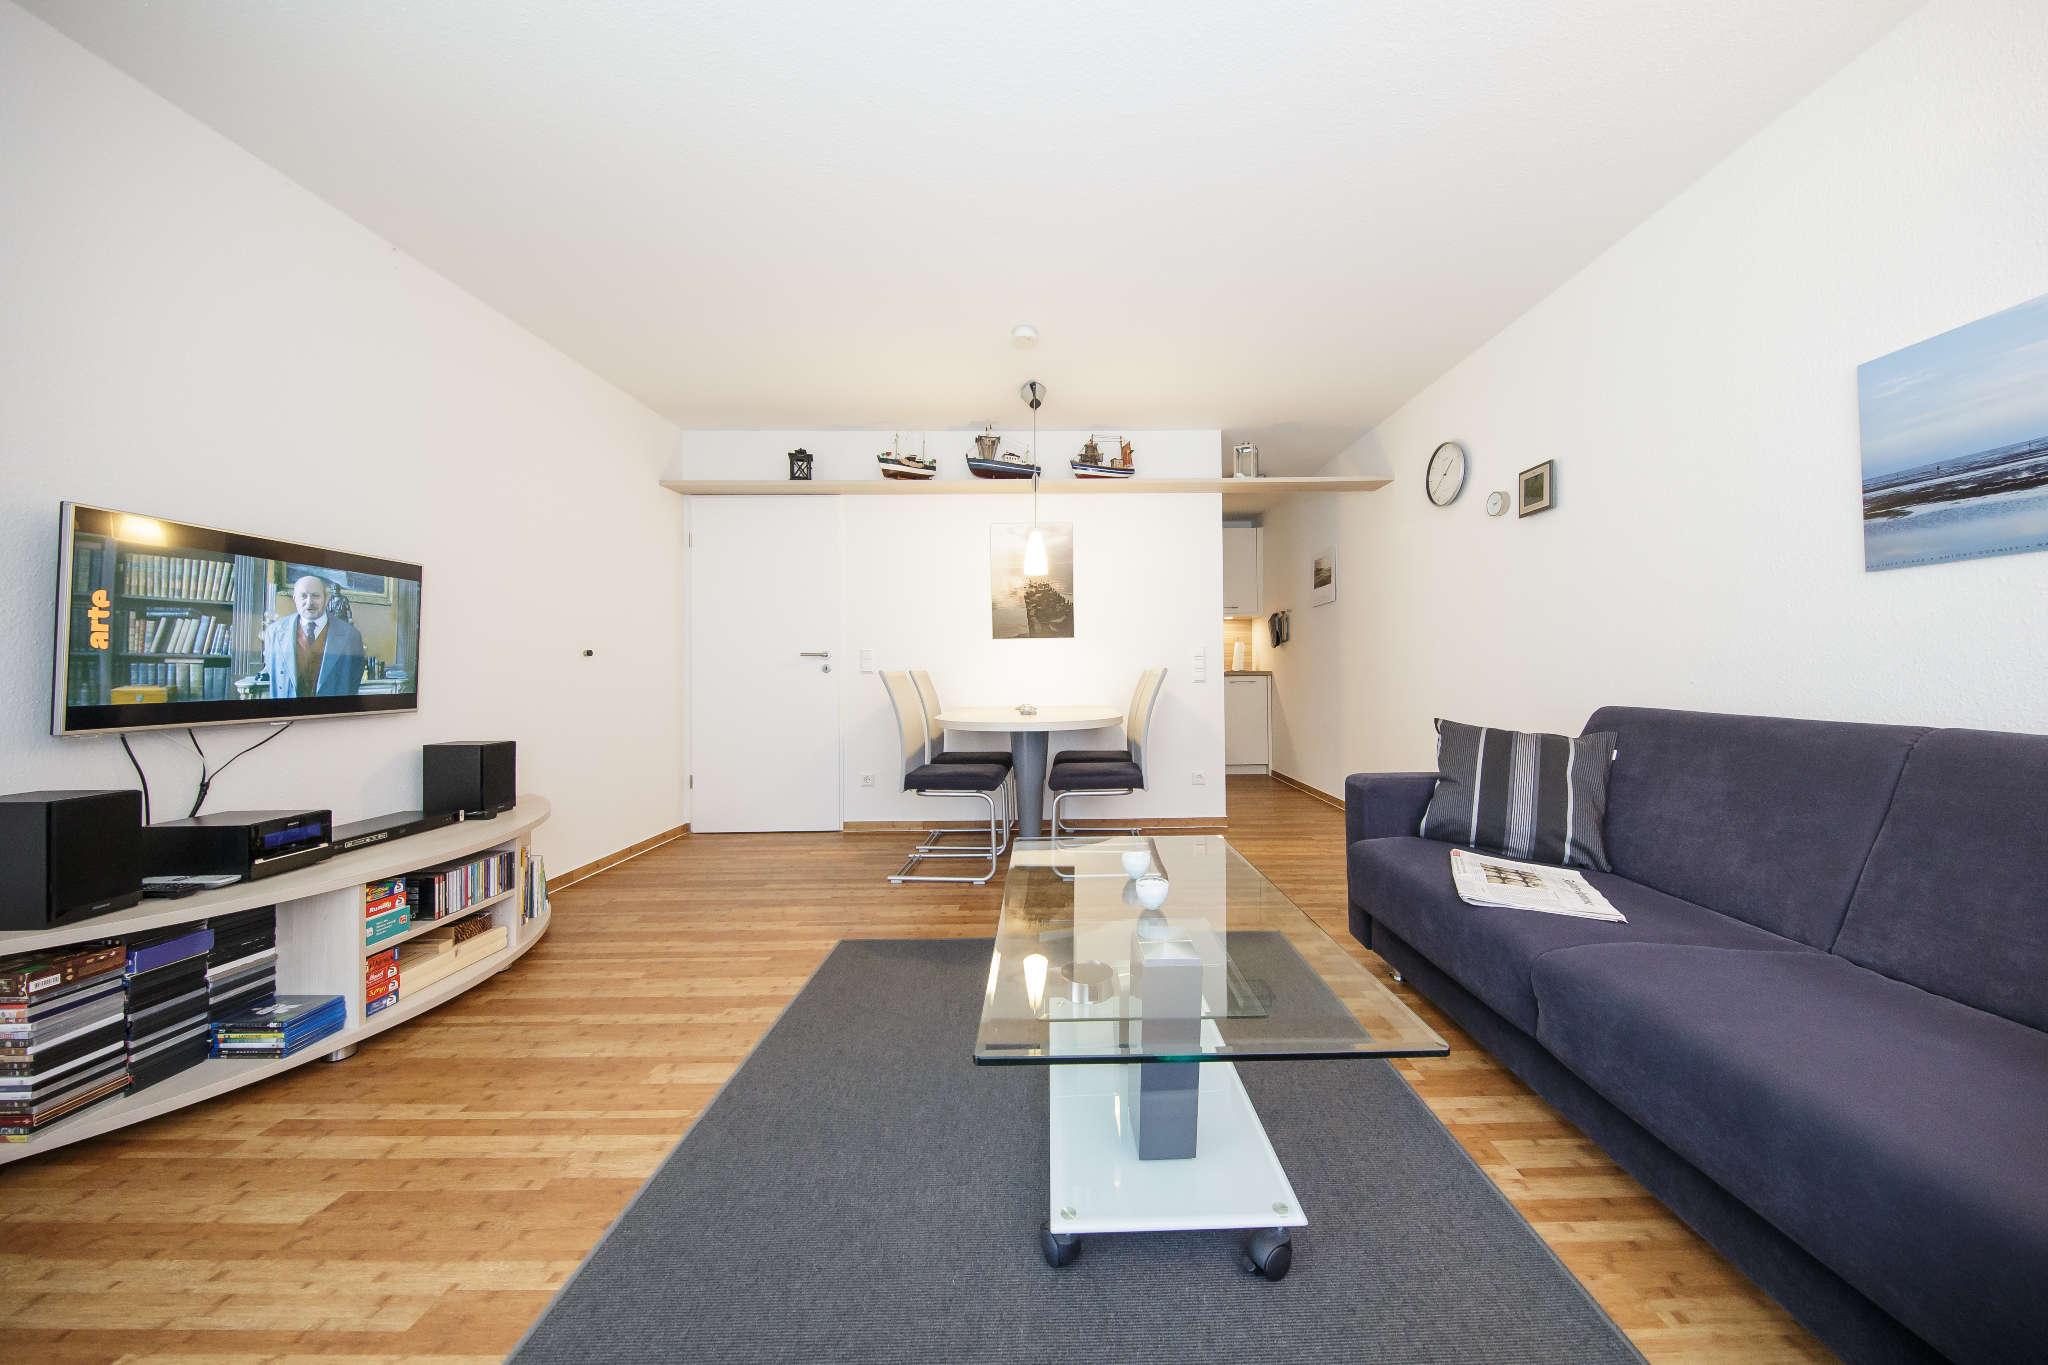 Residenz Hohe Lith - Ferienwohnung Nr. 1.03 in Cuxhaven ...